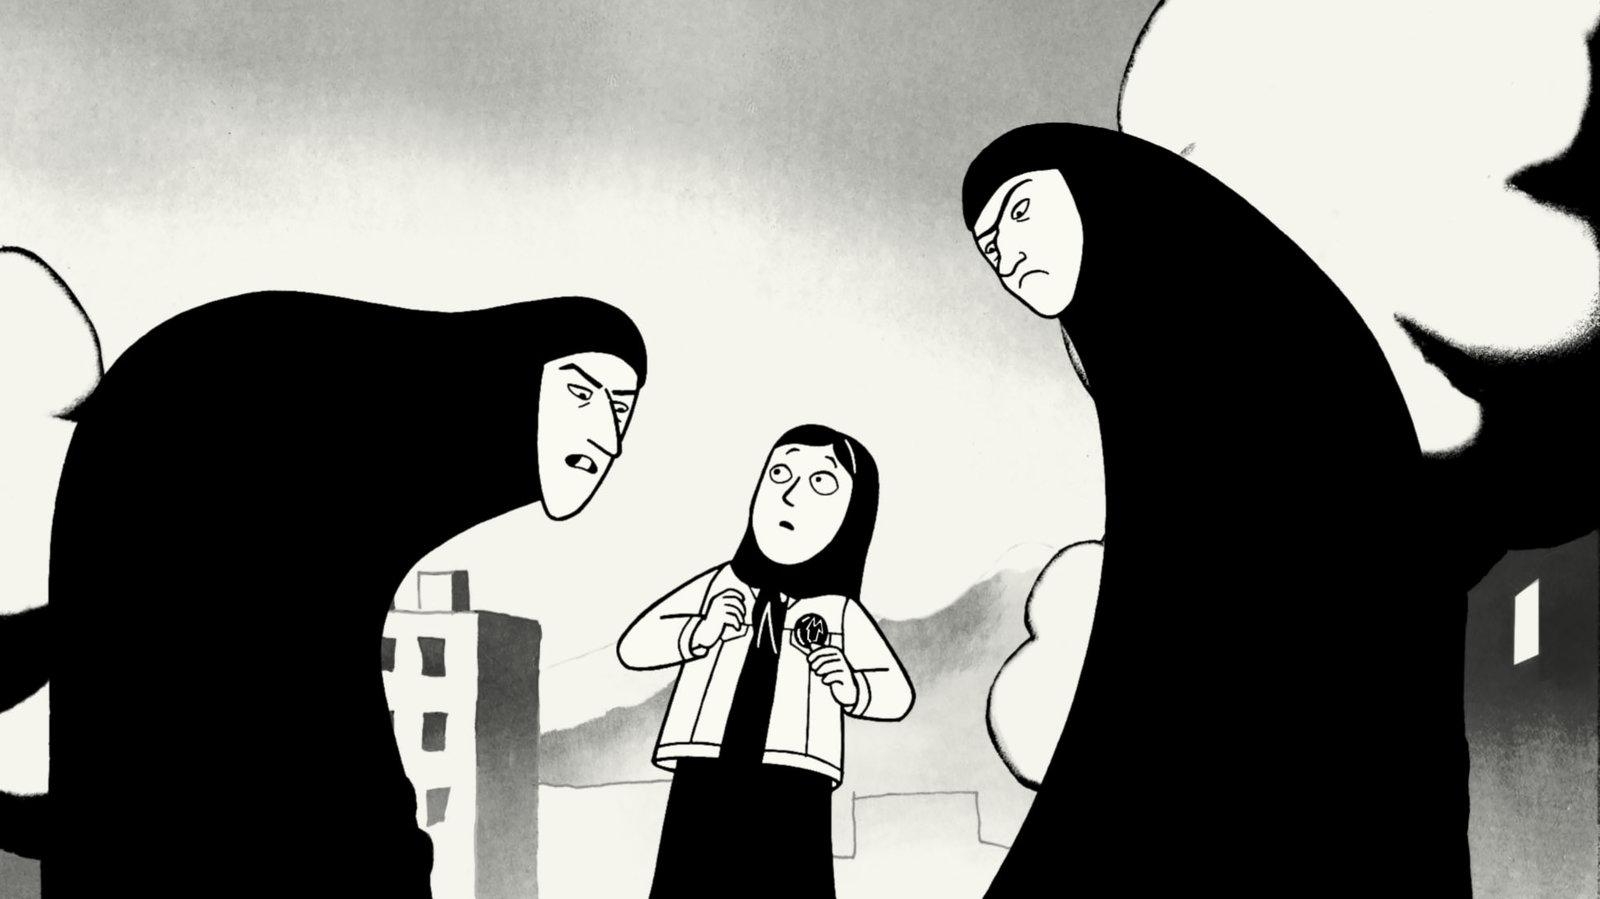 Persepolis Creator Marjane Satrapi Has Plenty Of Kick The Dot And Line